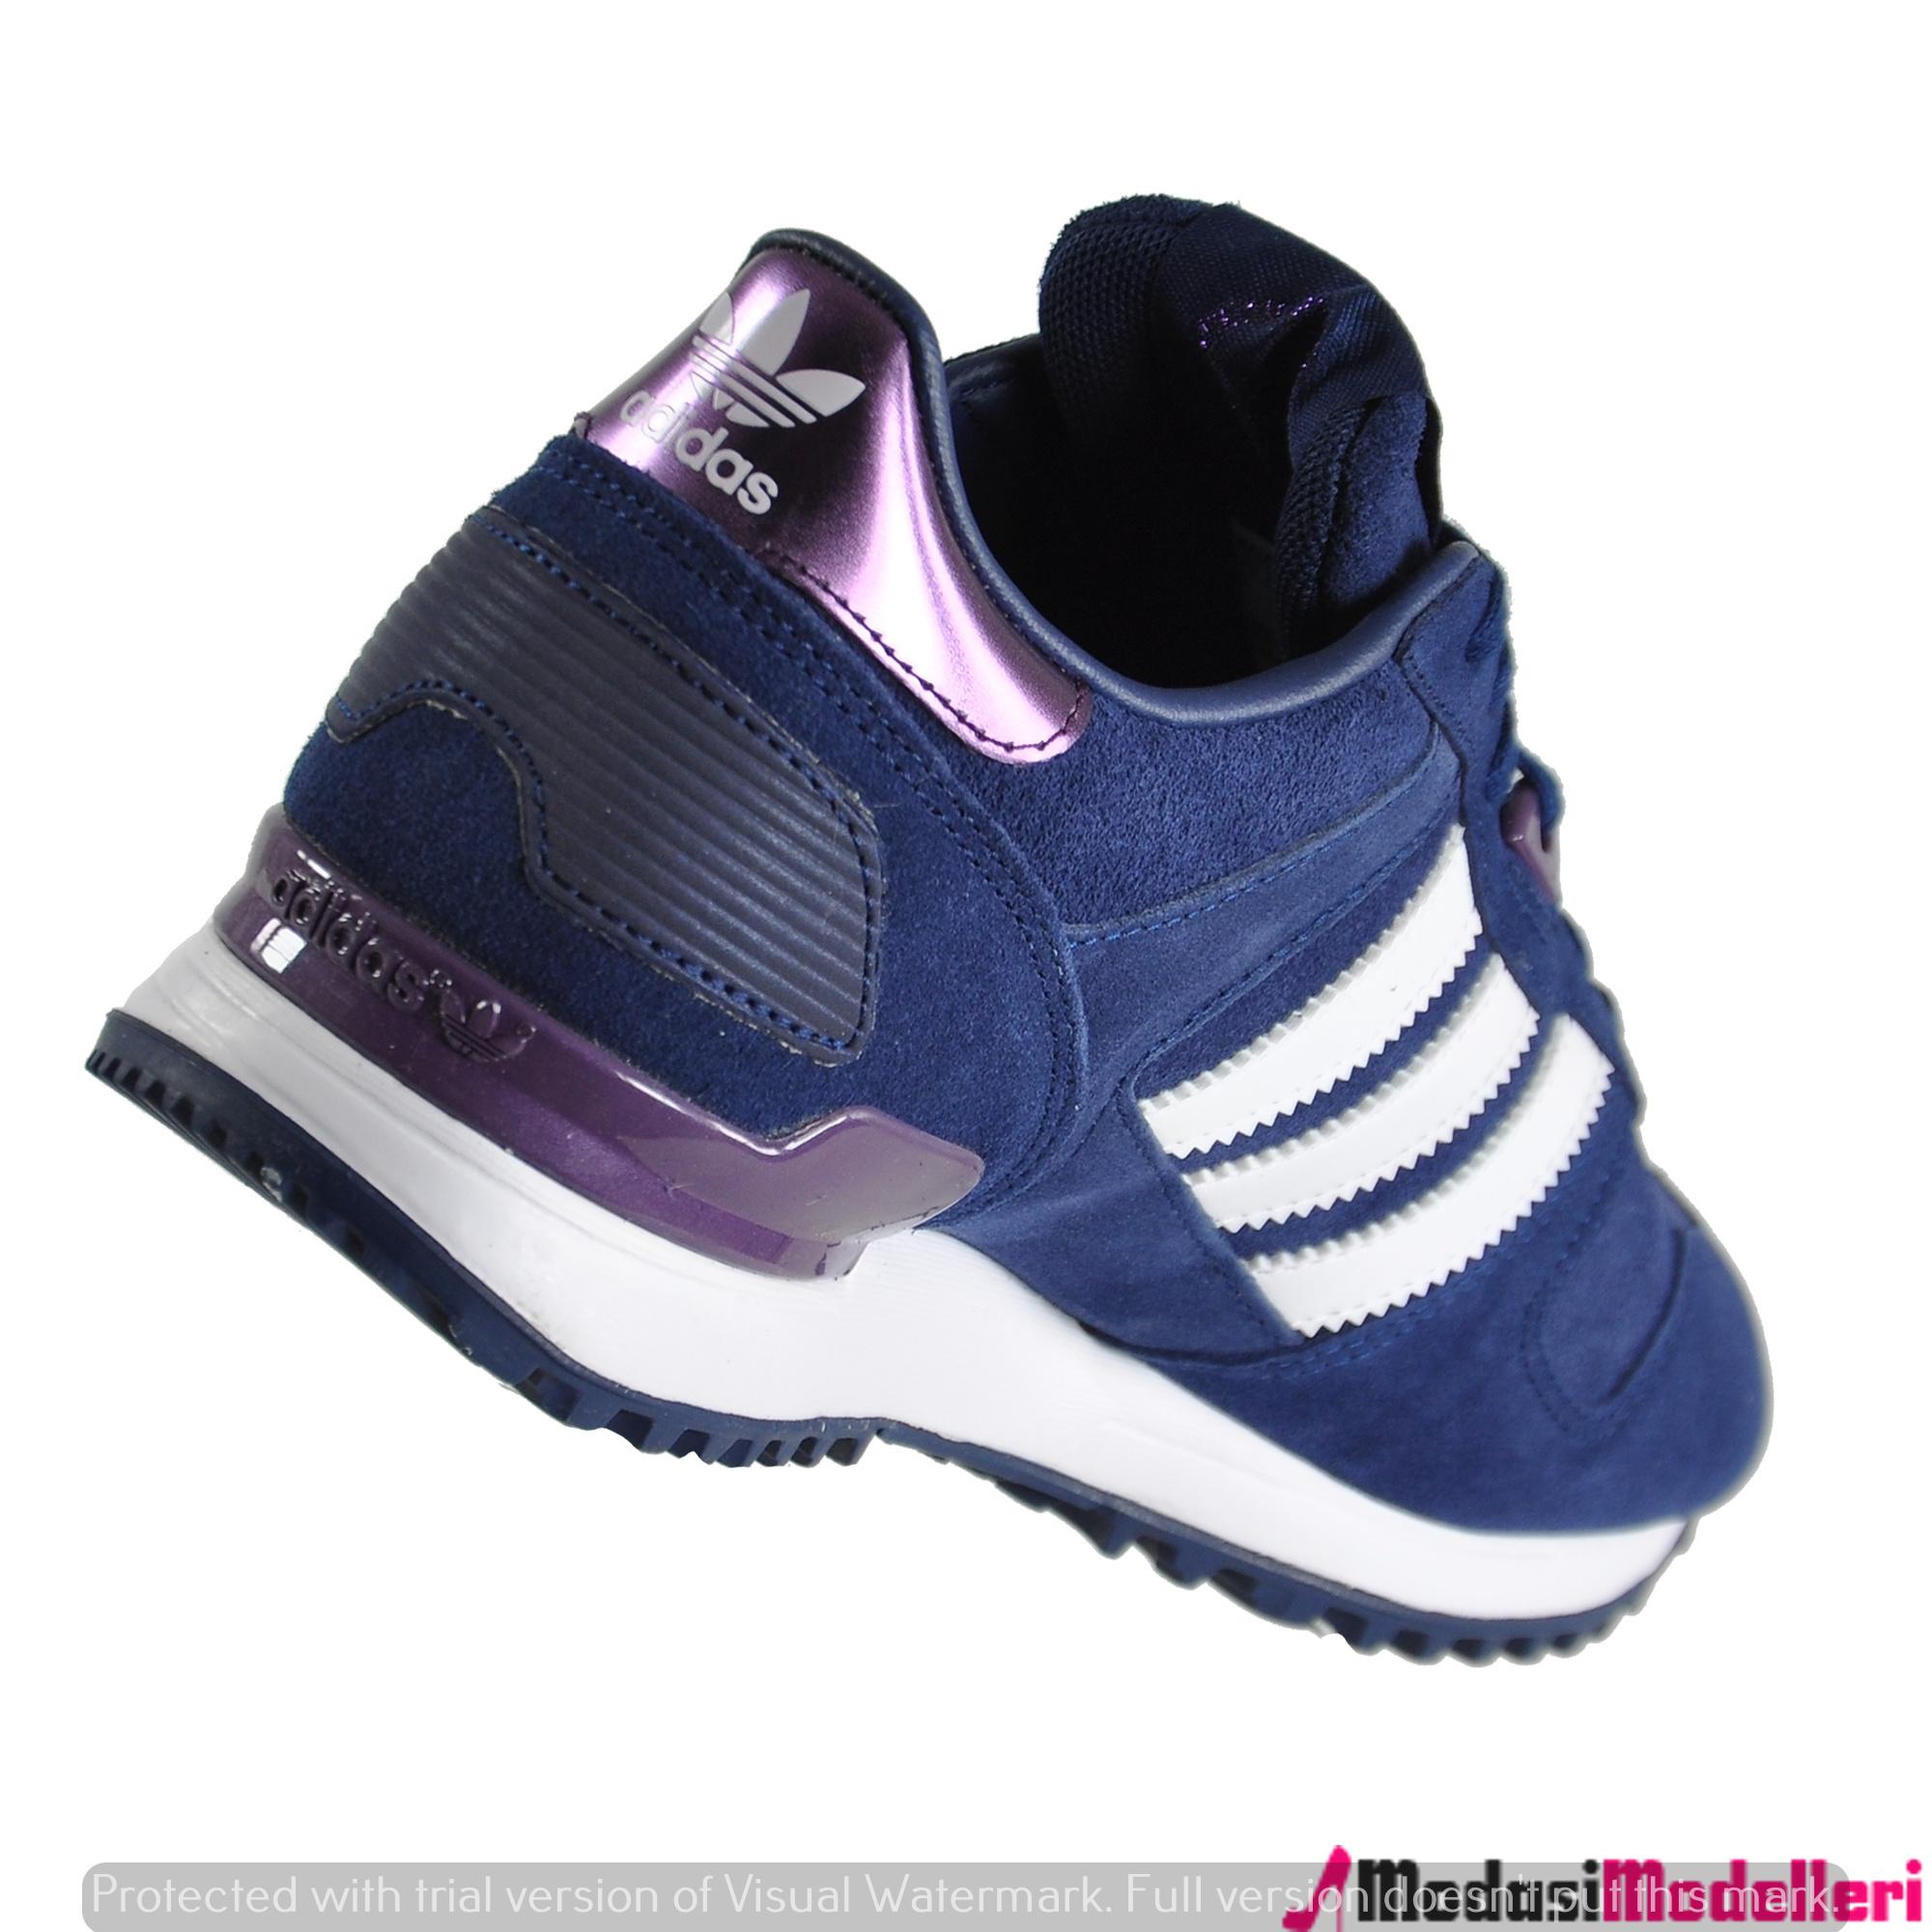 save off df5a7 49f89 adidas-spor-ayakkabı-modelleri-27